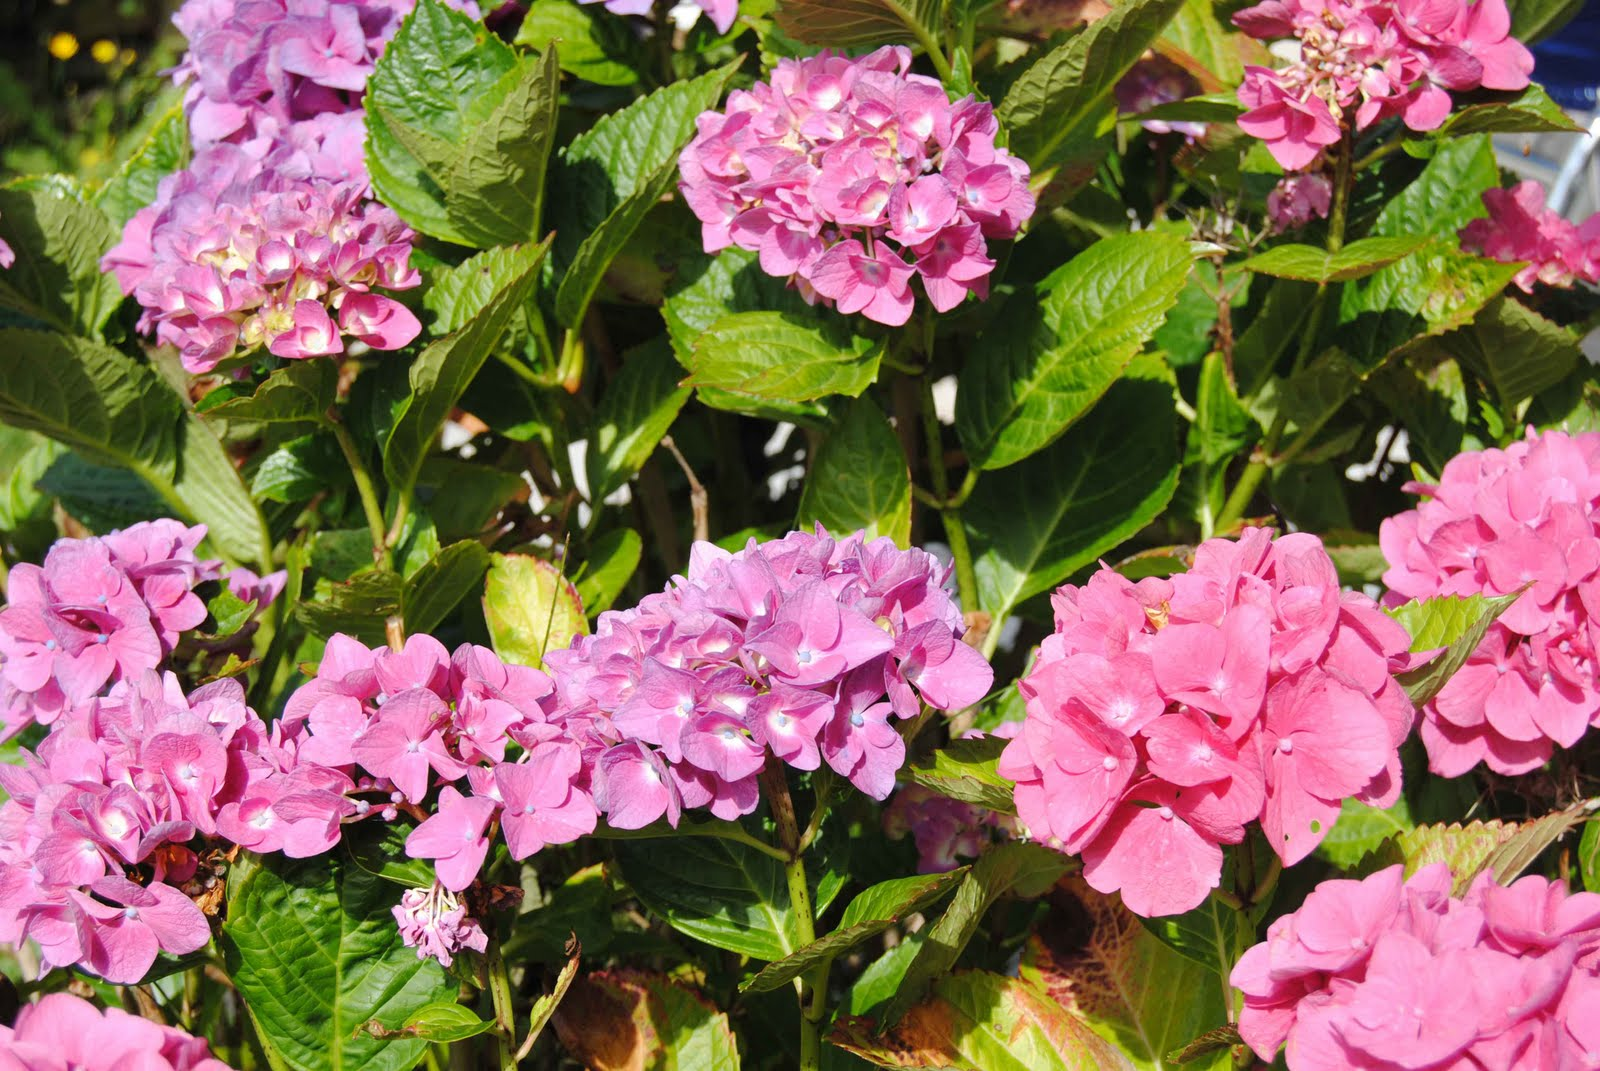 BretagneBilder Blumen im August